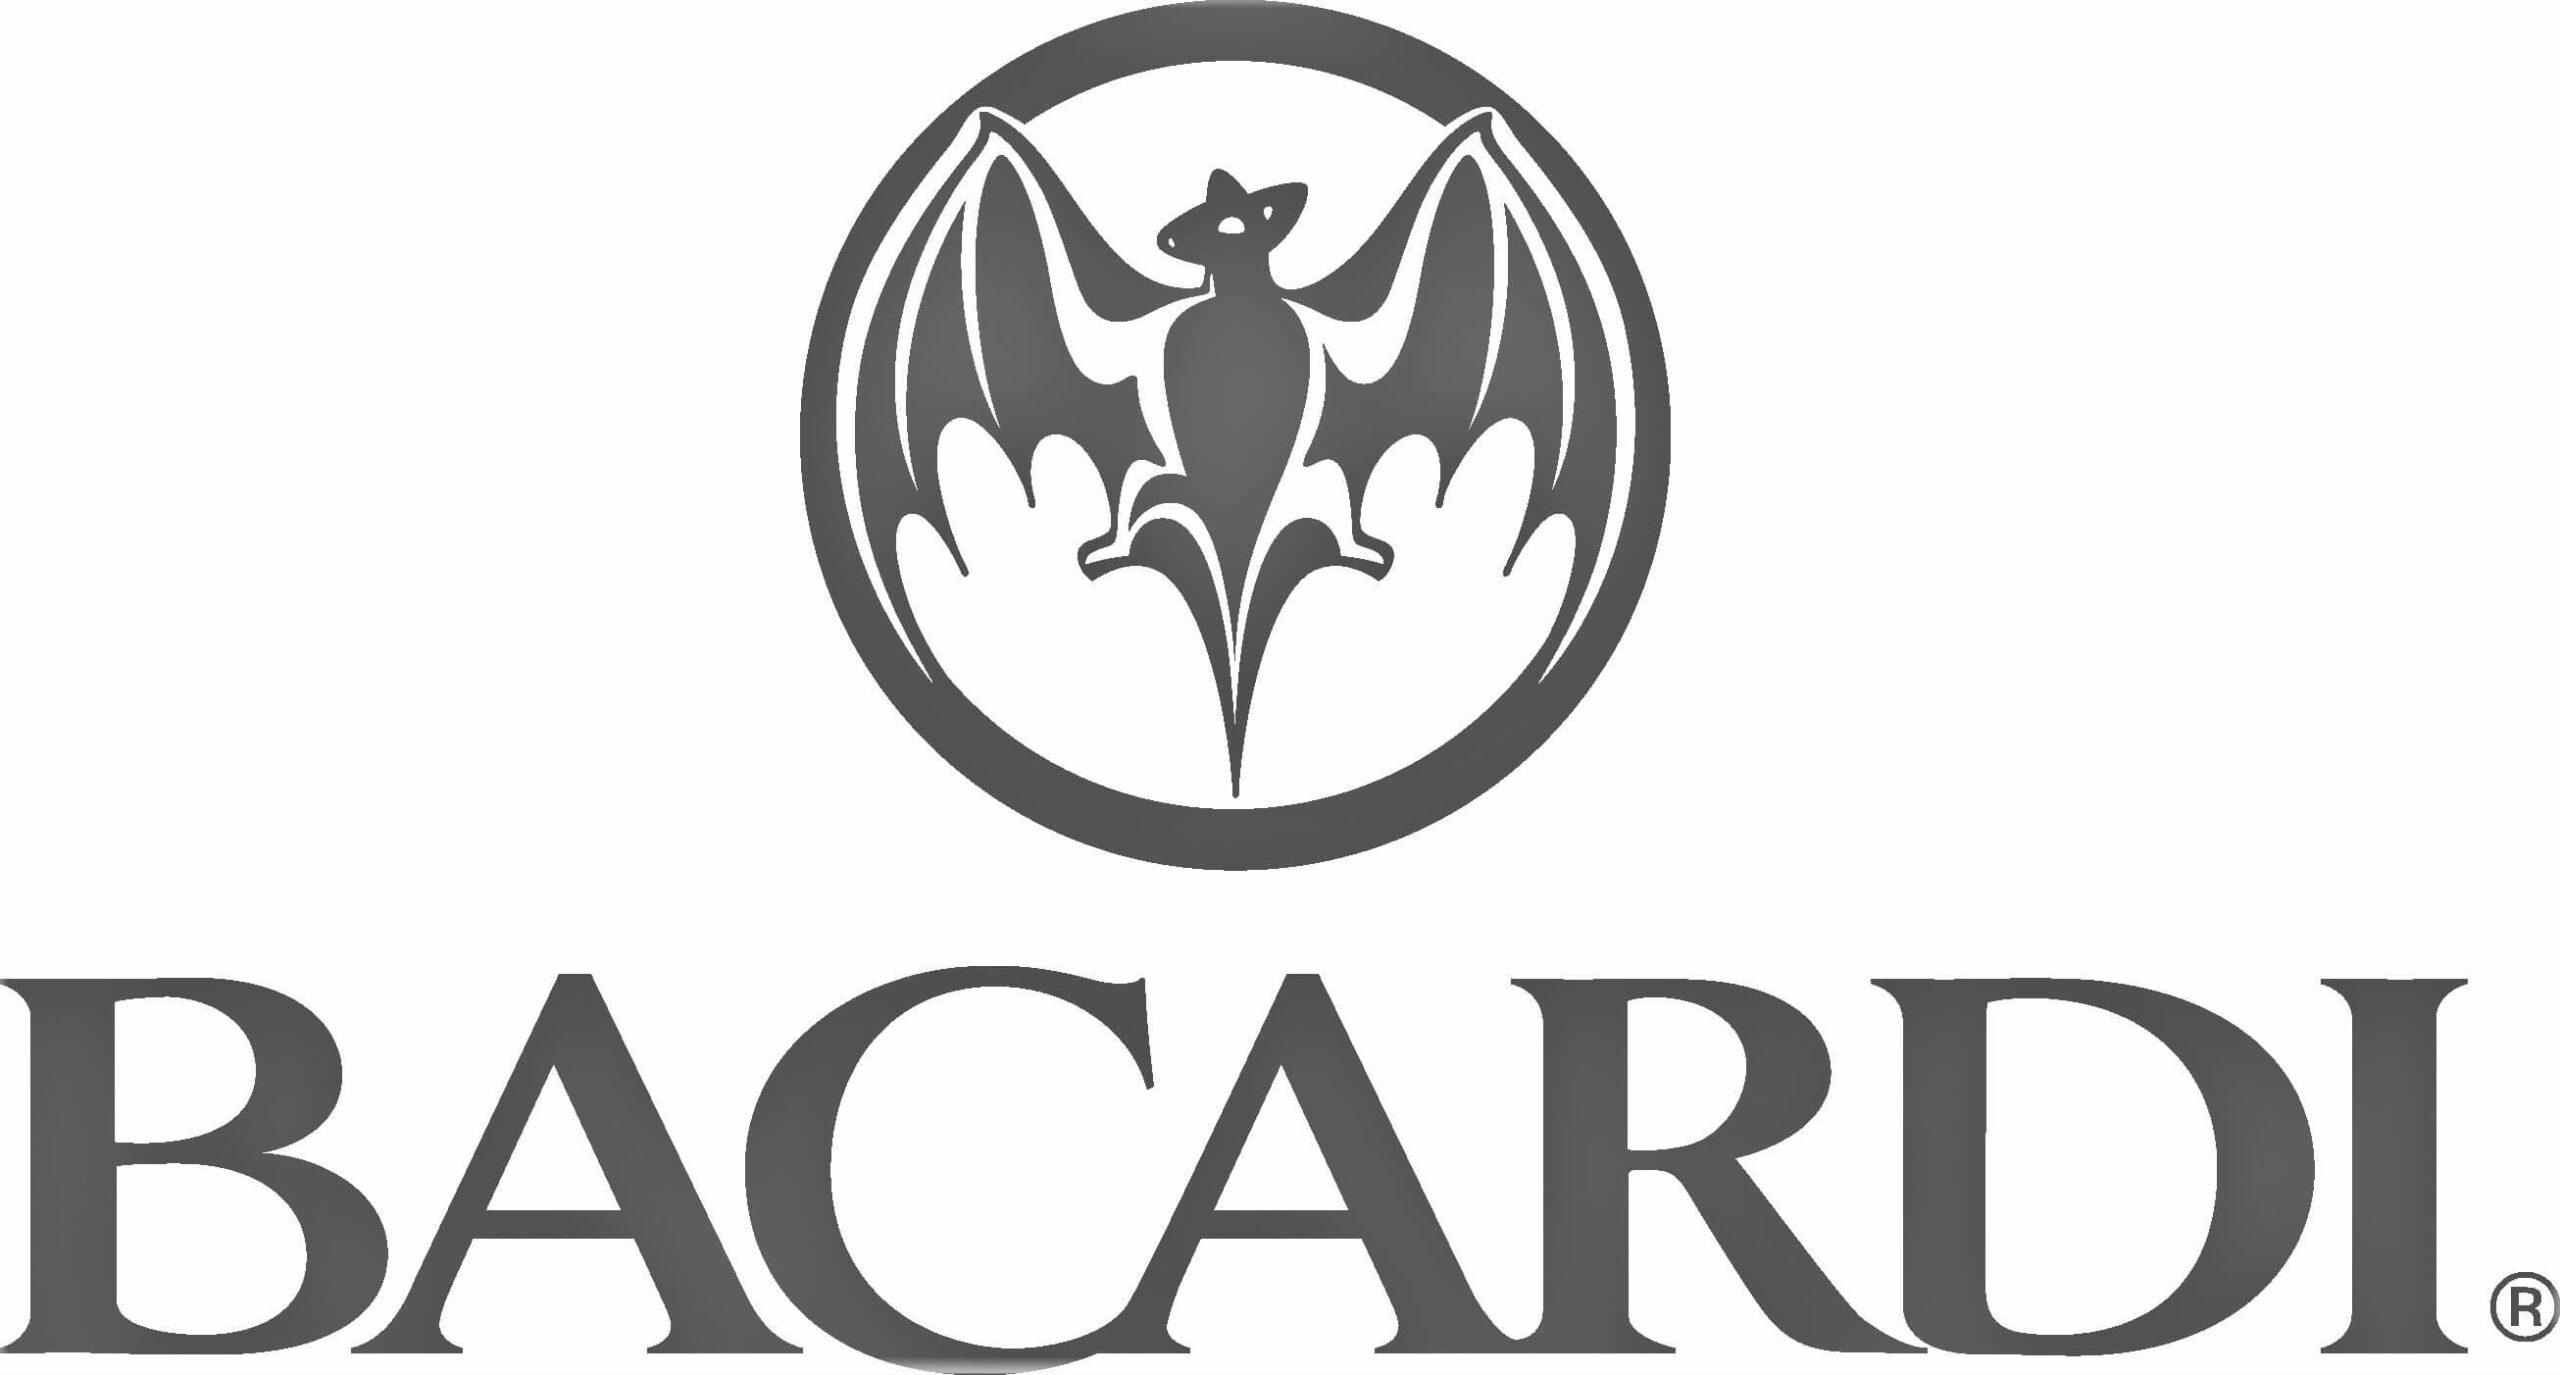 Bacardi logo HQ